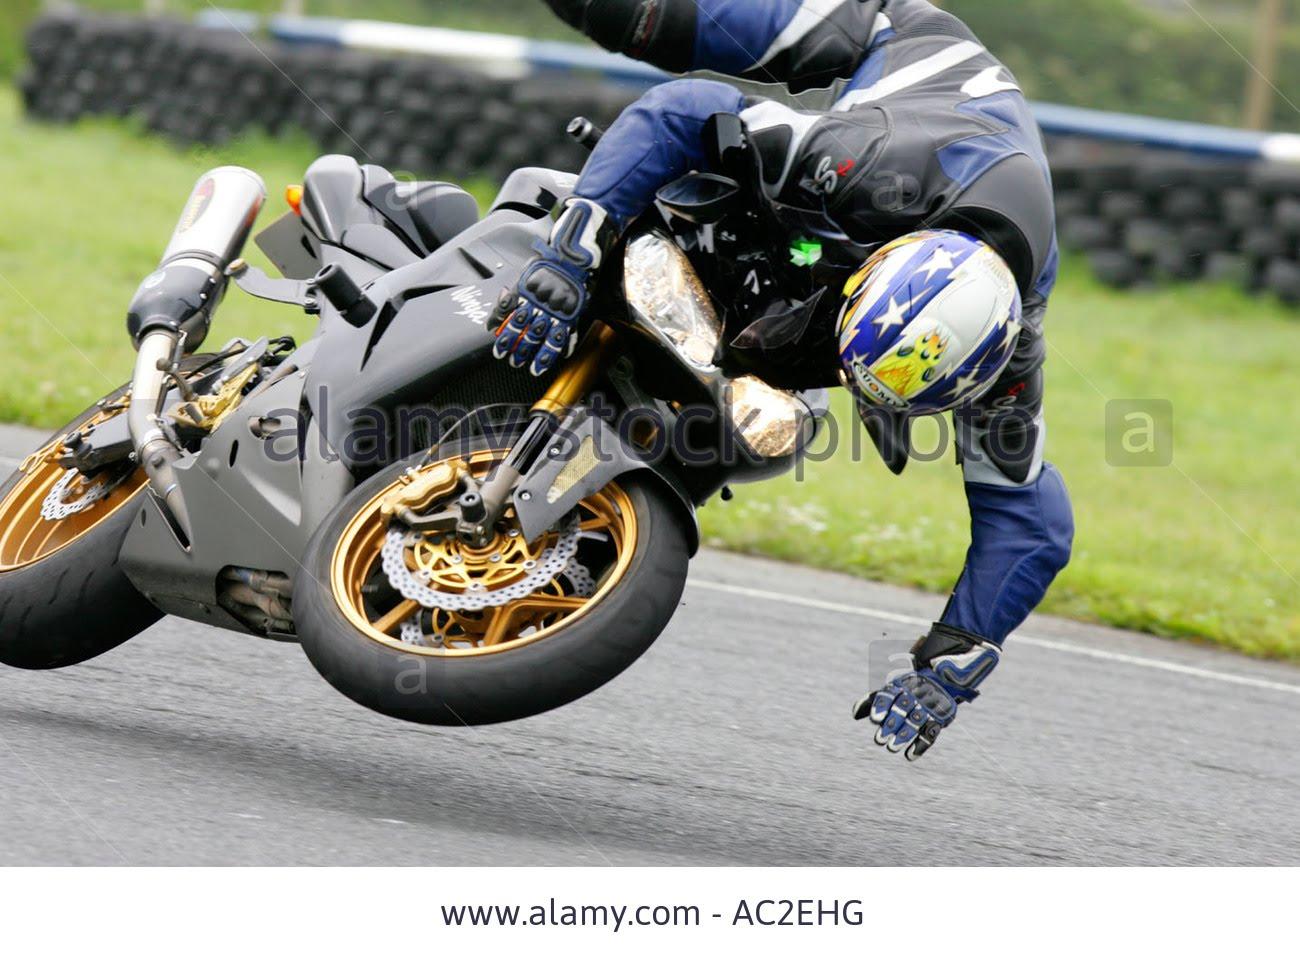 Drawn bike sport bike Motorcycle Super Bike CRASH Moto